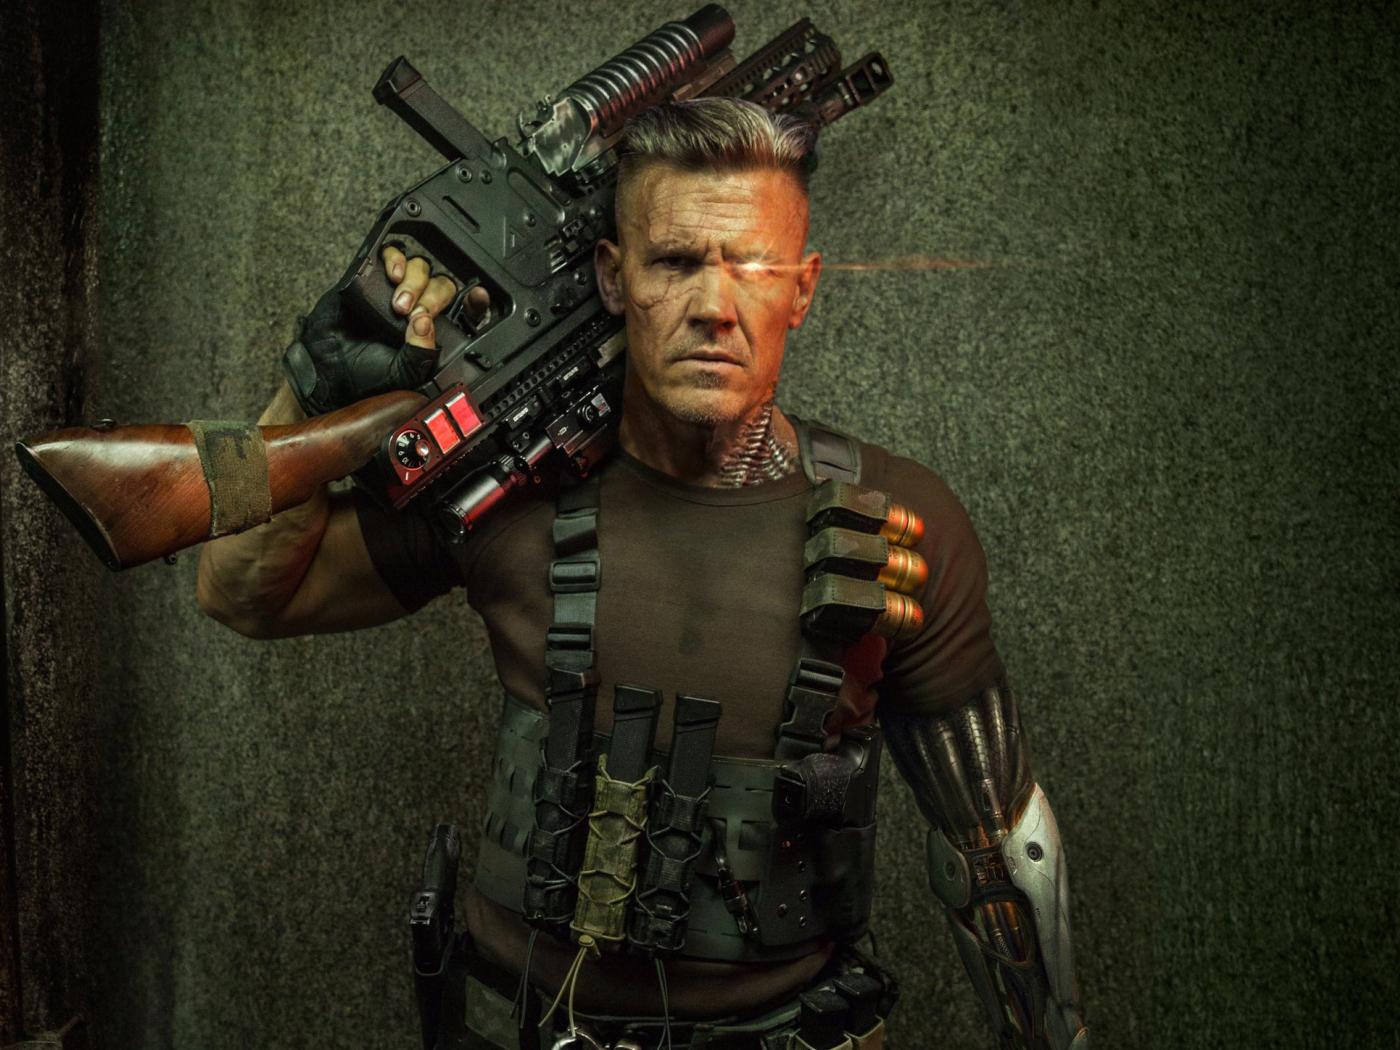 Cable Deadpool 2  Full Hd 2k Wallpaper